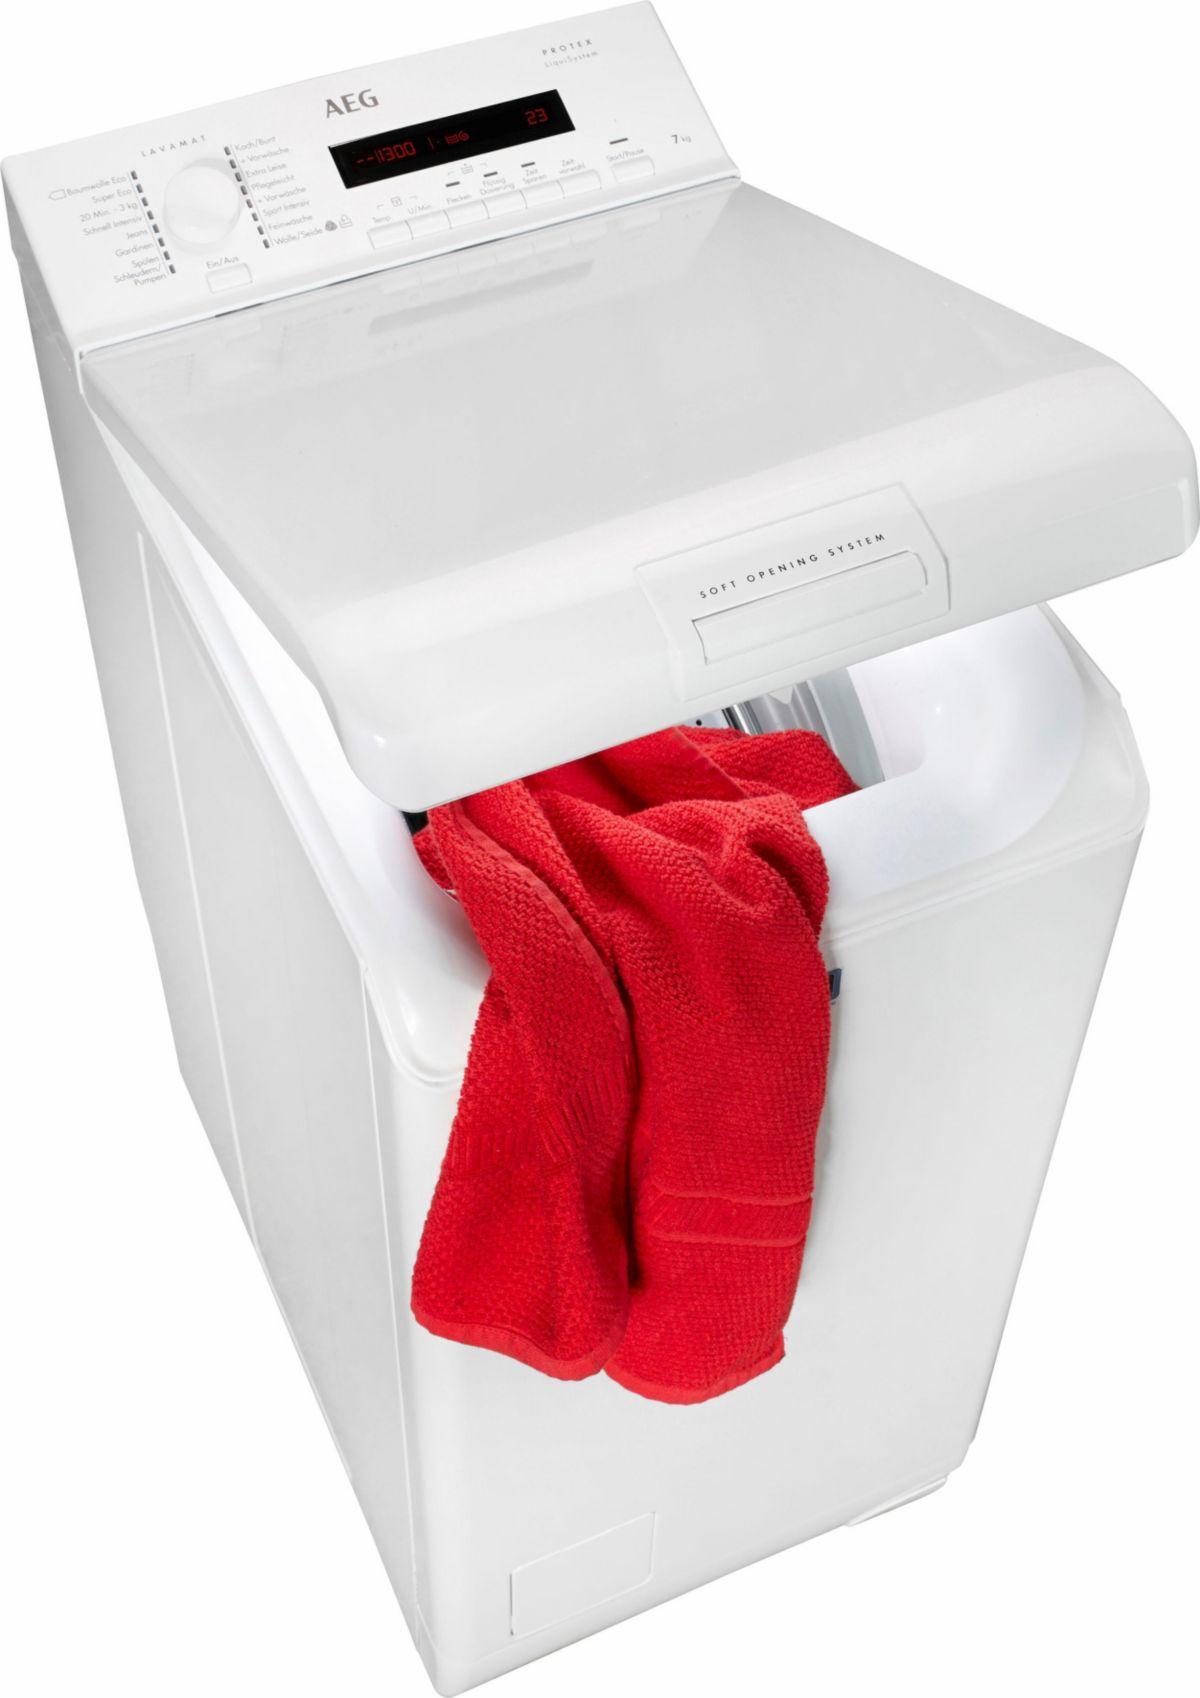 AEG Waschmaschine Toplader LAVAMAT L72270TL, A+...